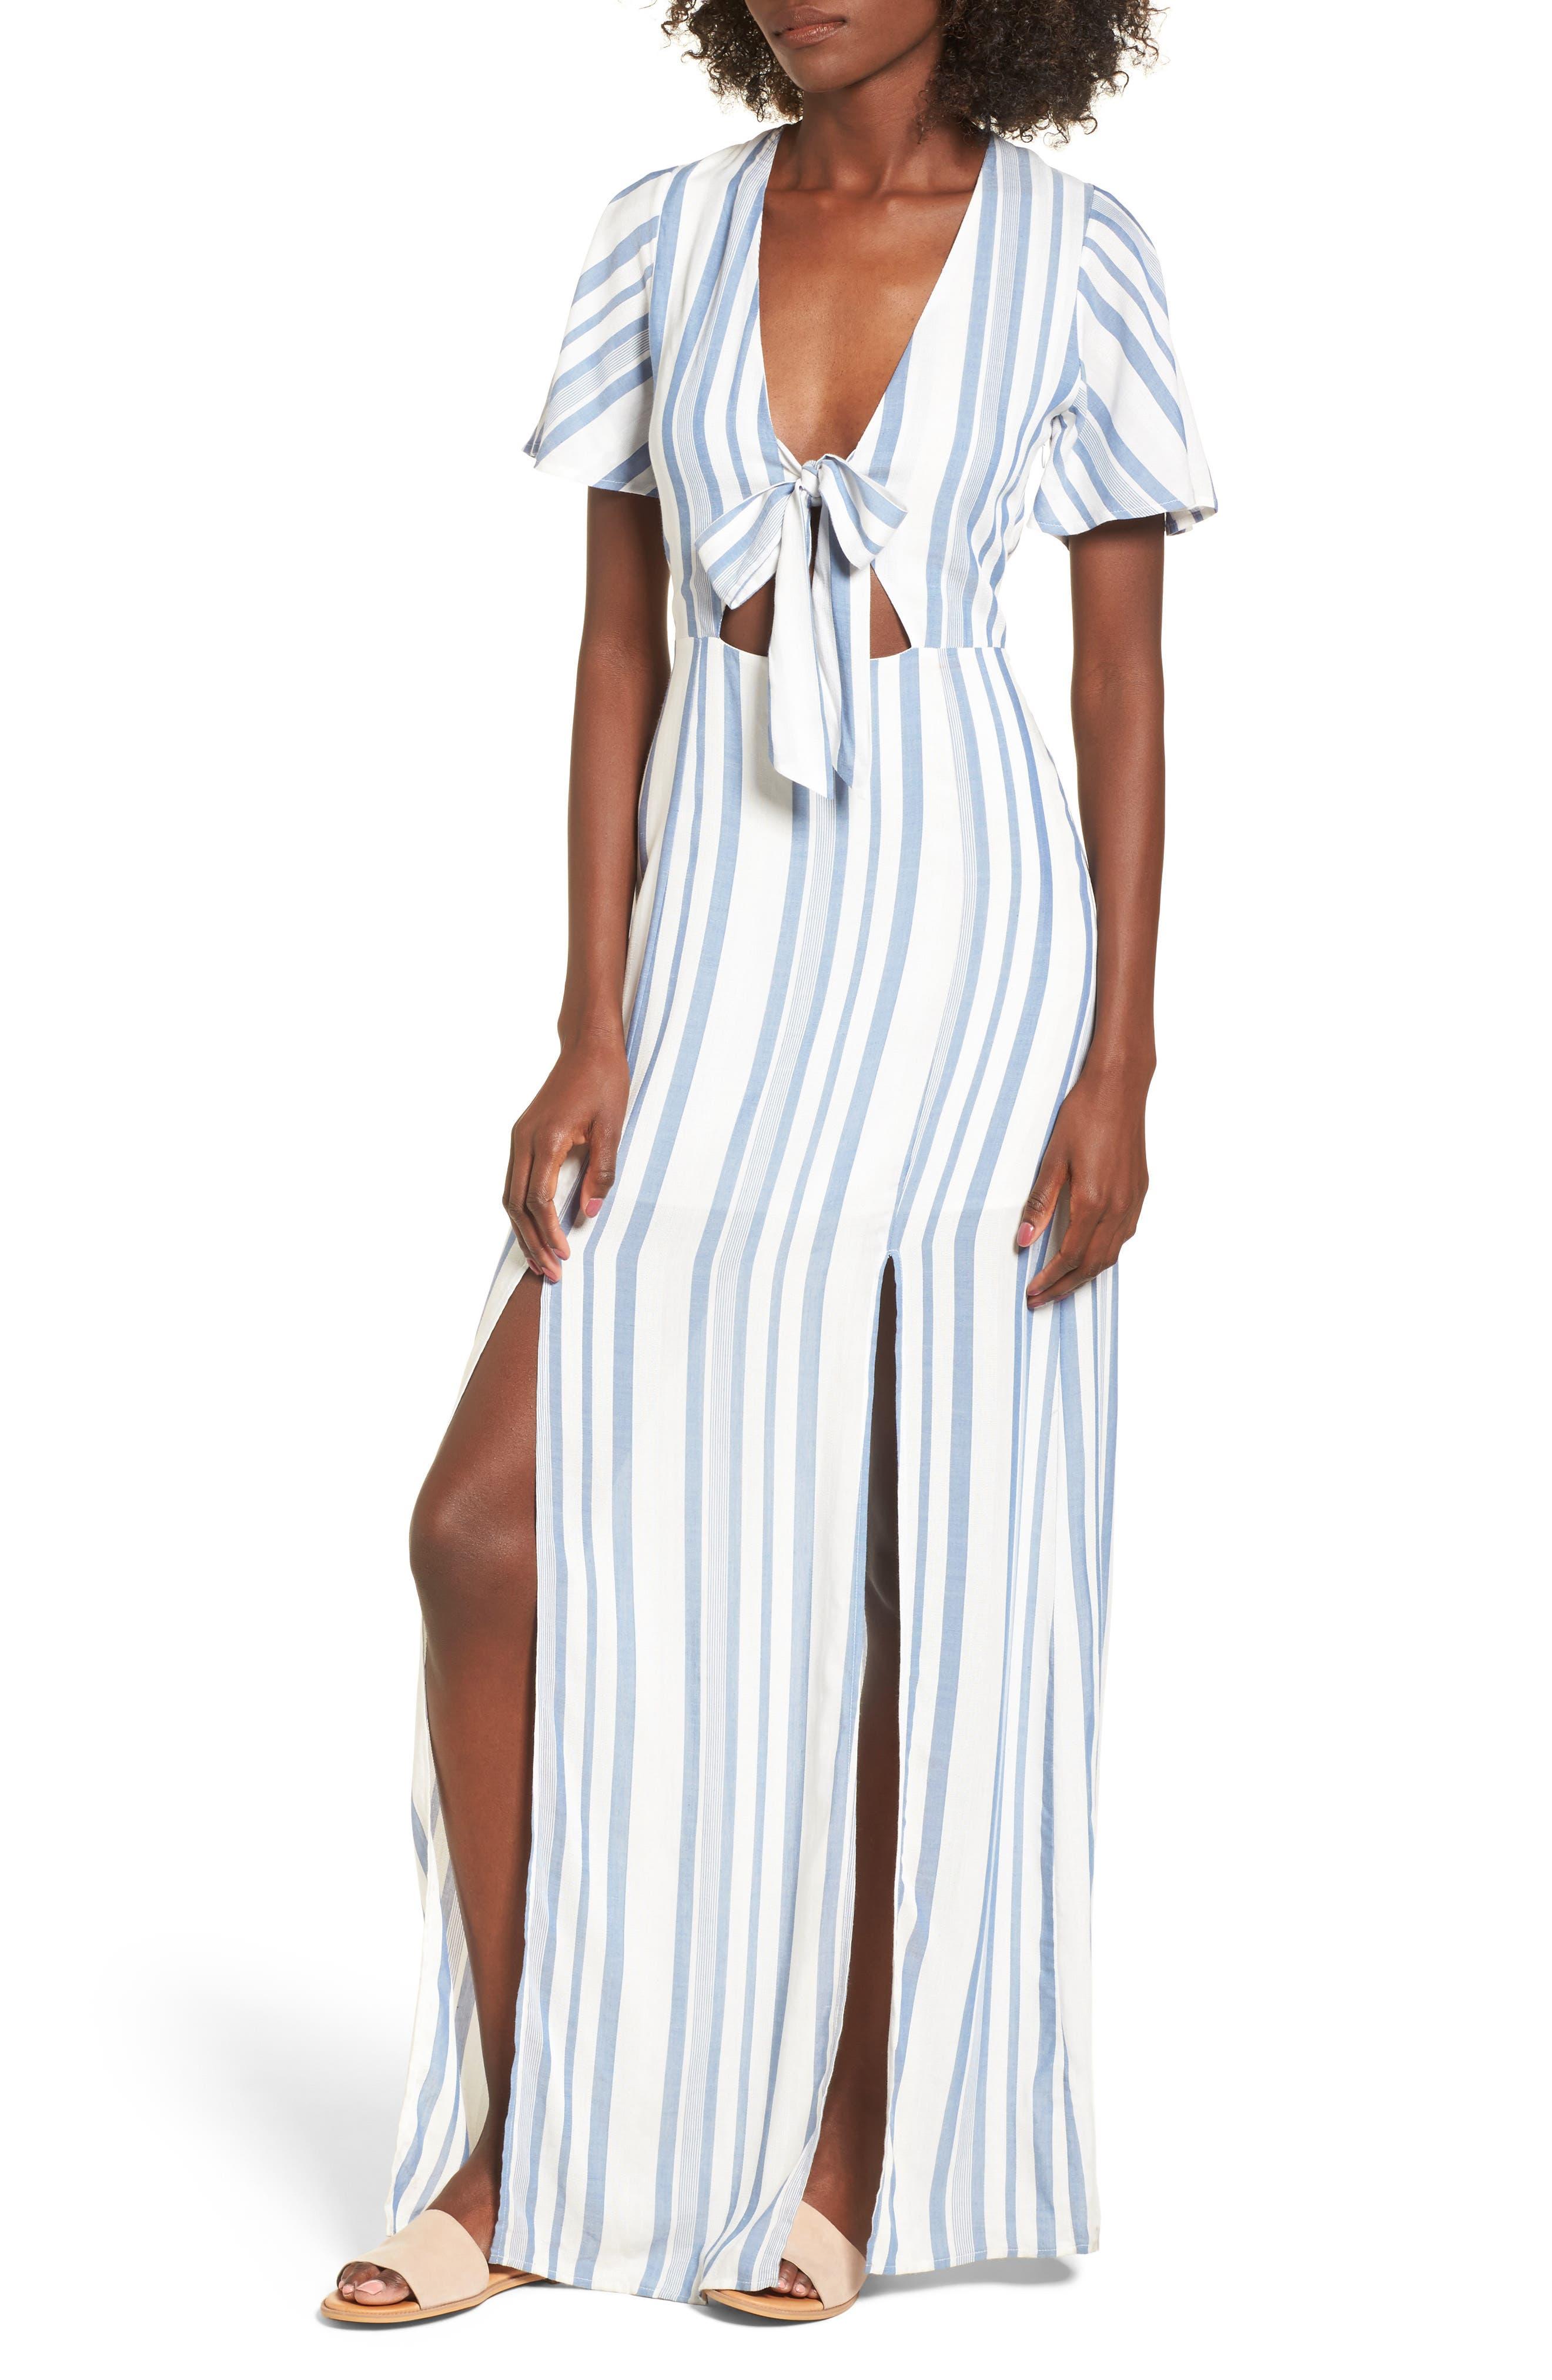 Bow Front Marina Maxi Dress,                             Main thumbnail 1, color,                             White/ Blue